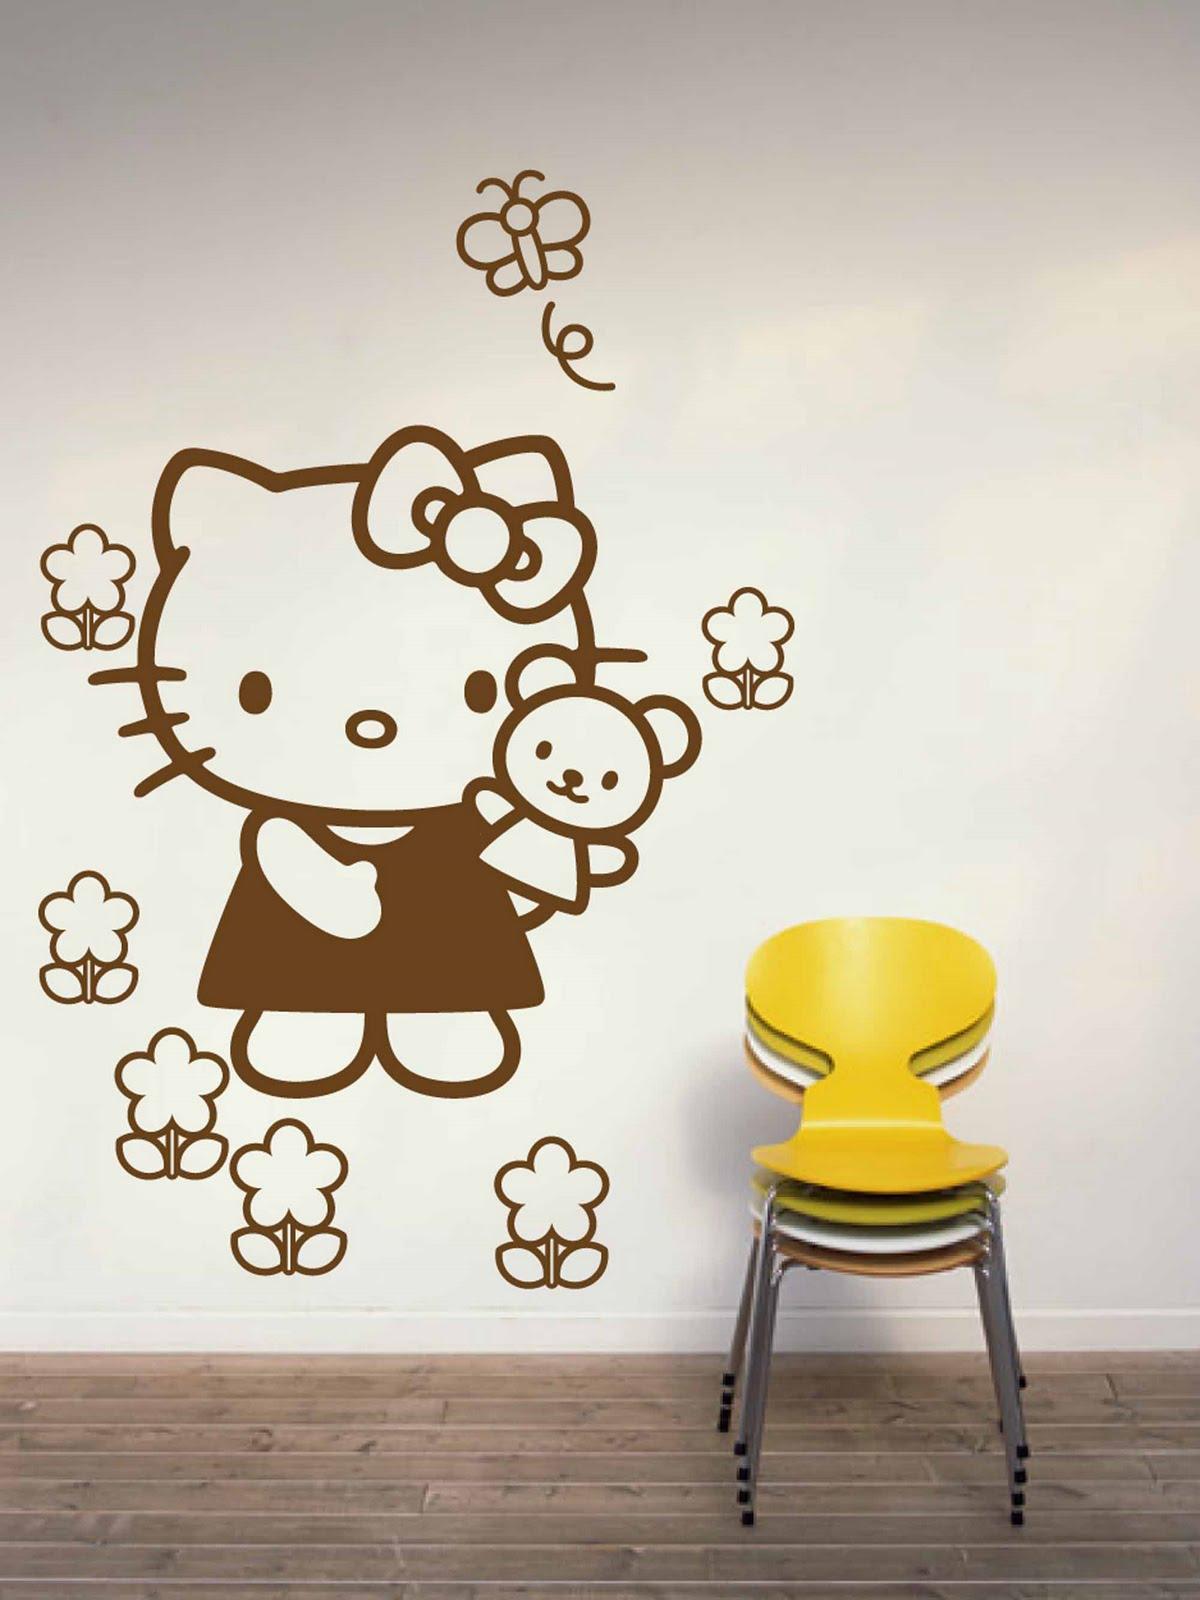 Nb vinilos hello kitty flores for Vinilo hello kitty